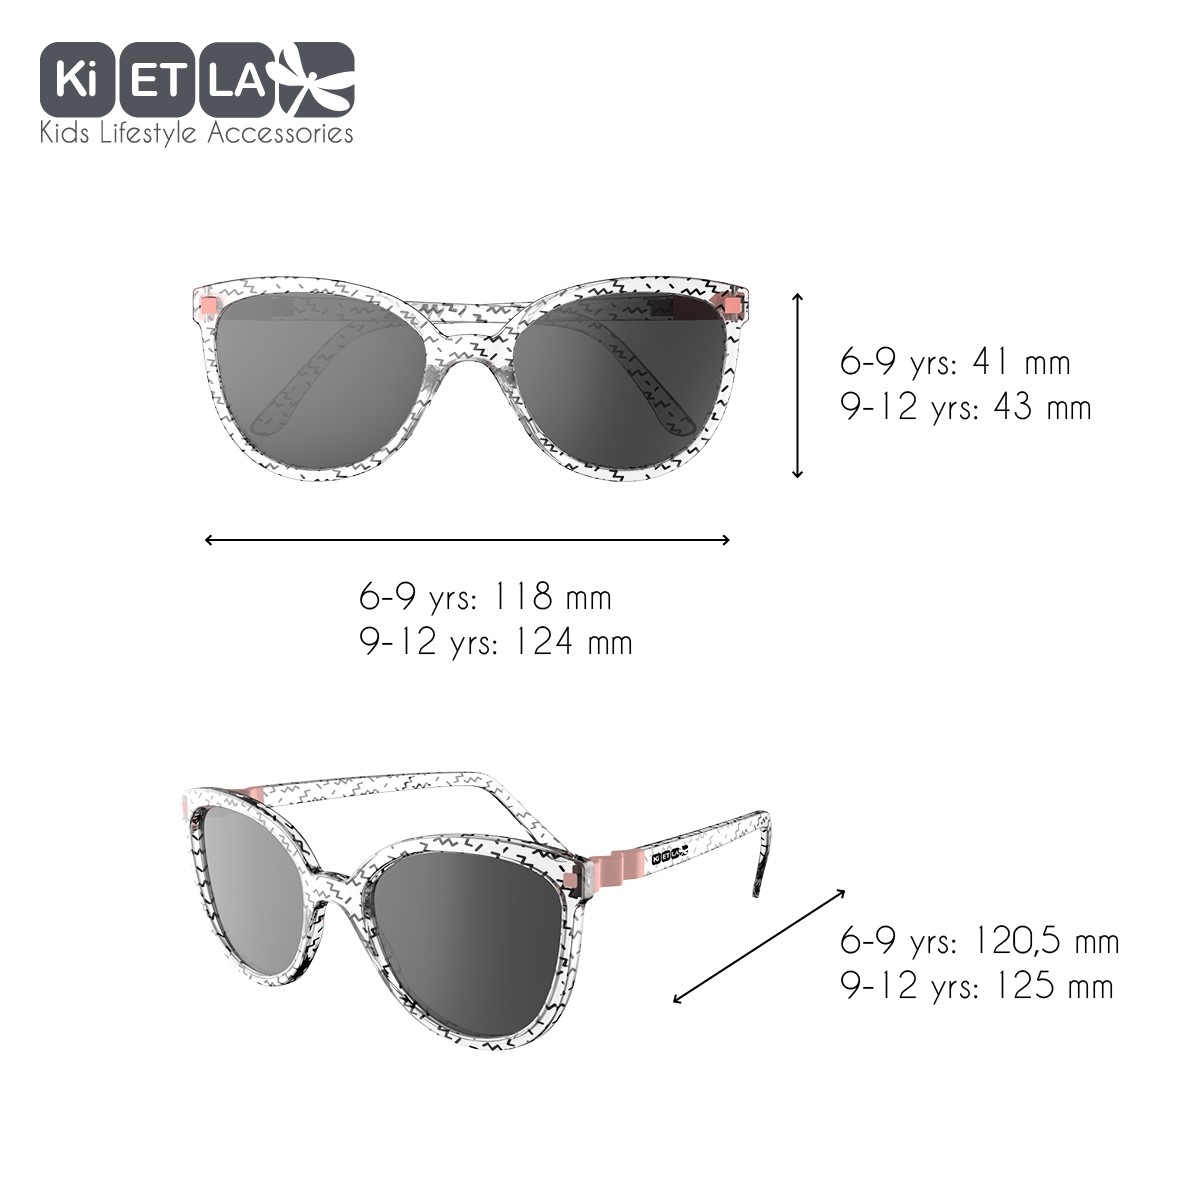 Good kids sunglasses Ki ET LA